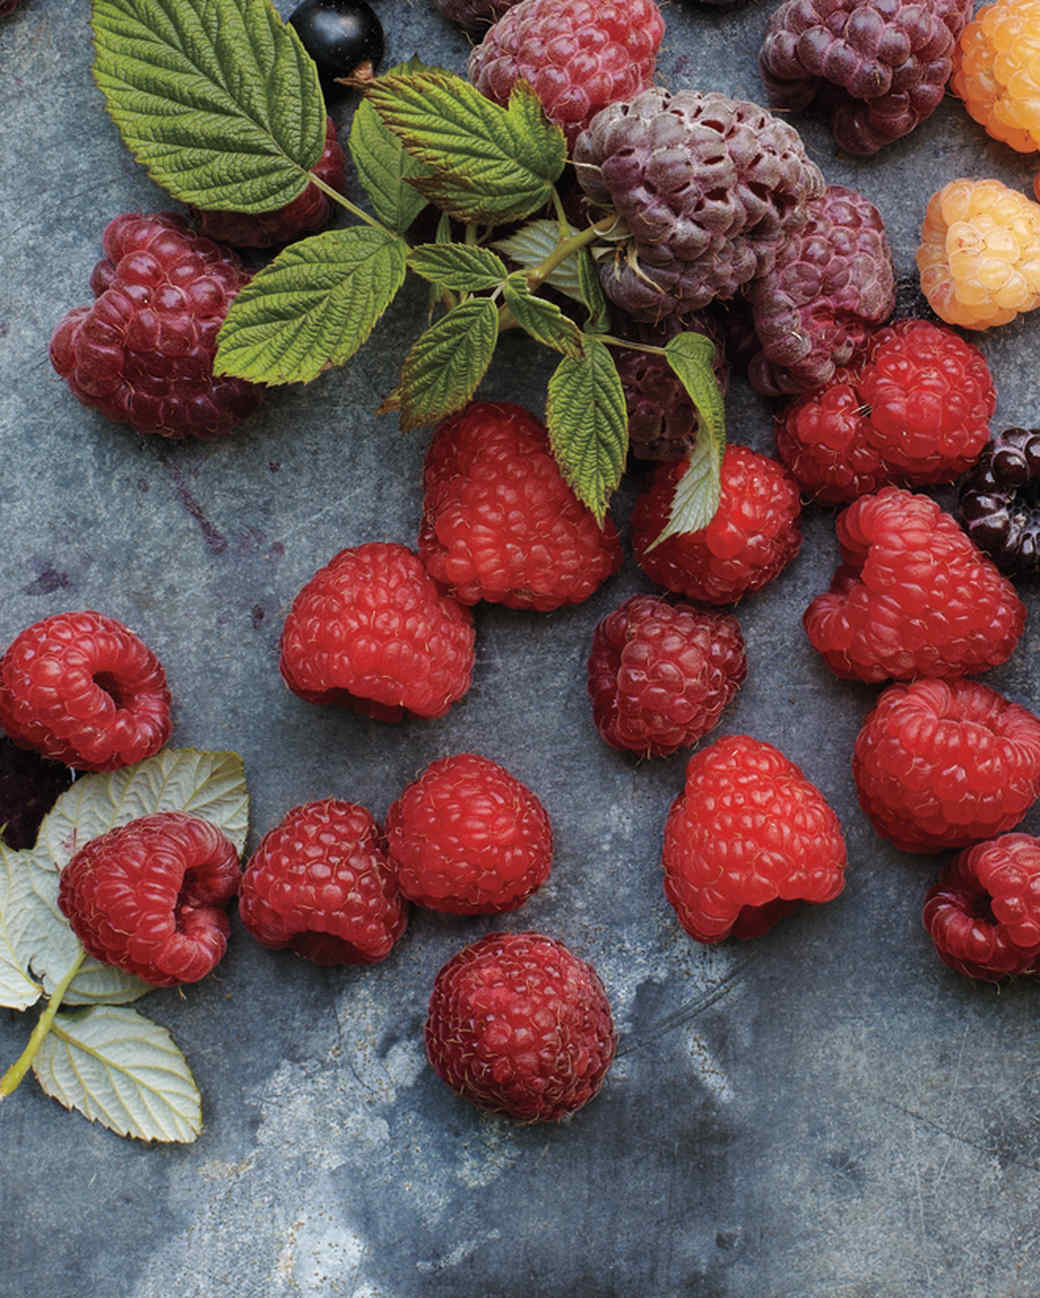 reveille-raspberry-mld107637.jpg